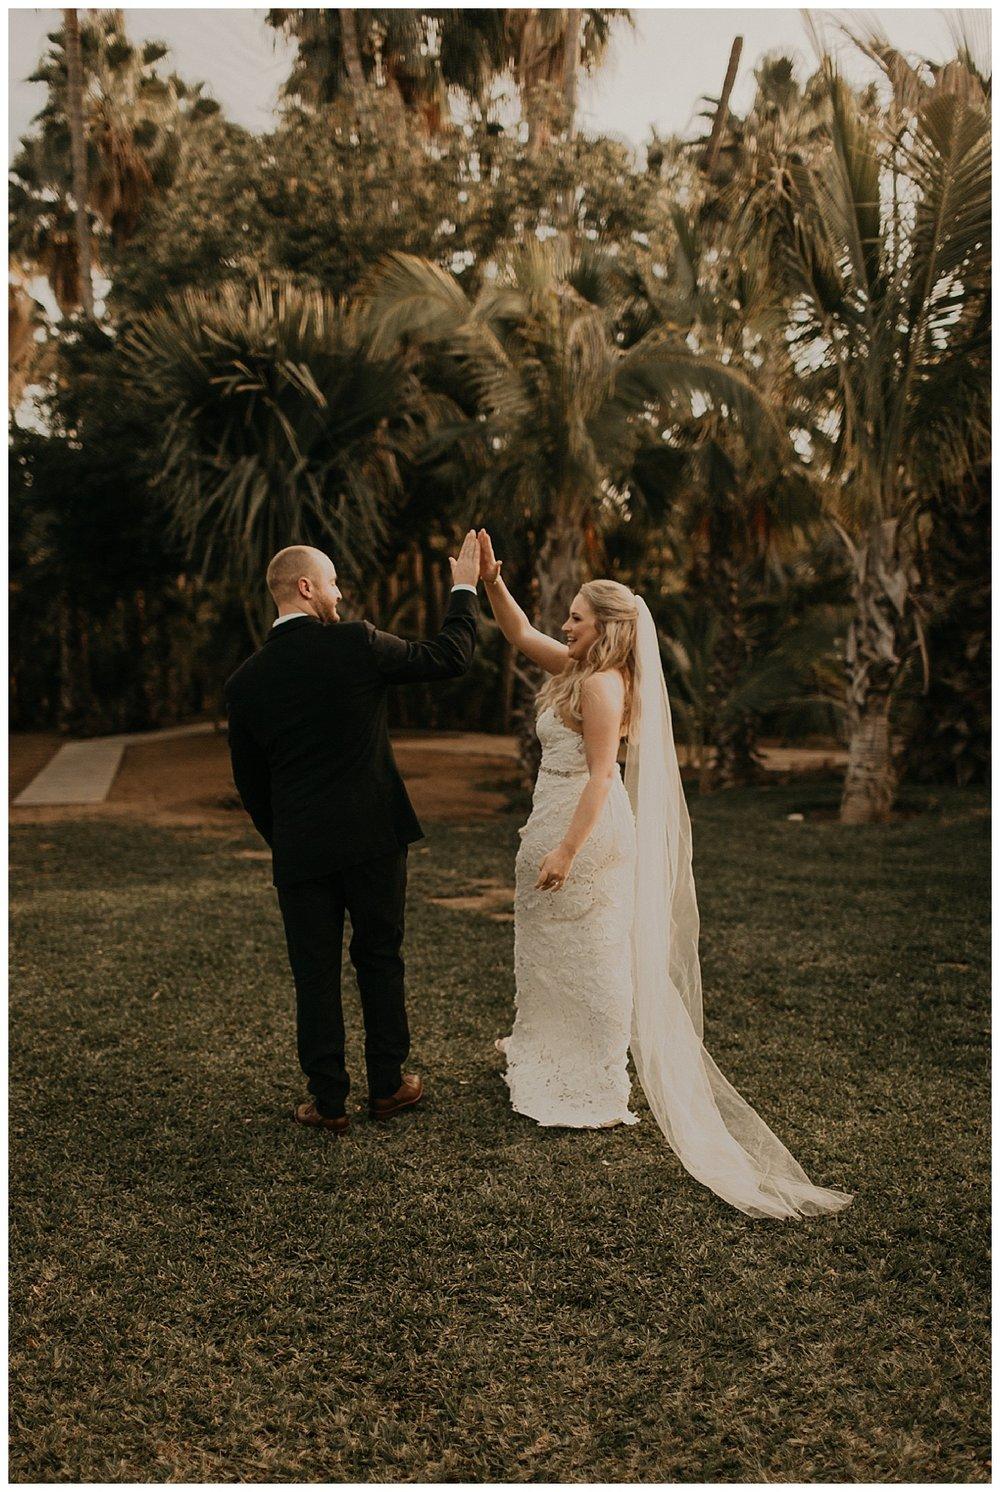 Bixby+Pine-PNW-Wedding-Planners-And-Designers_1763.jpg